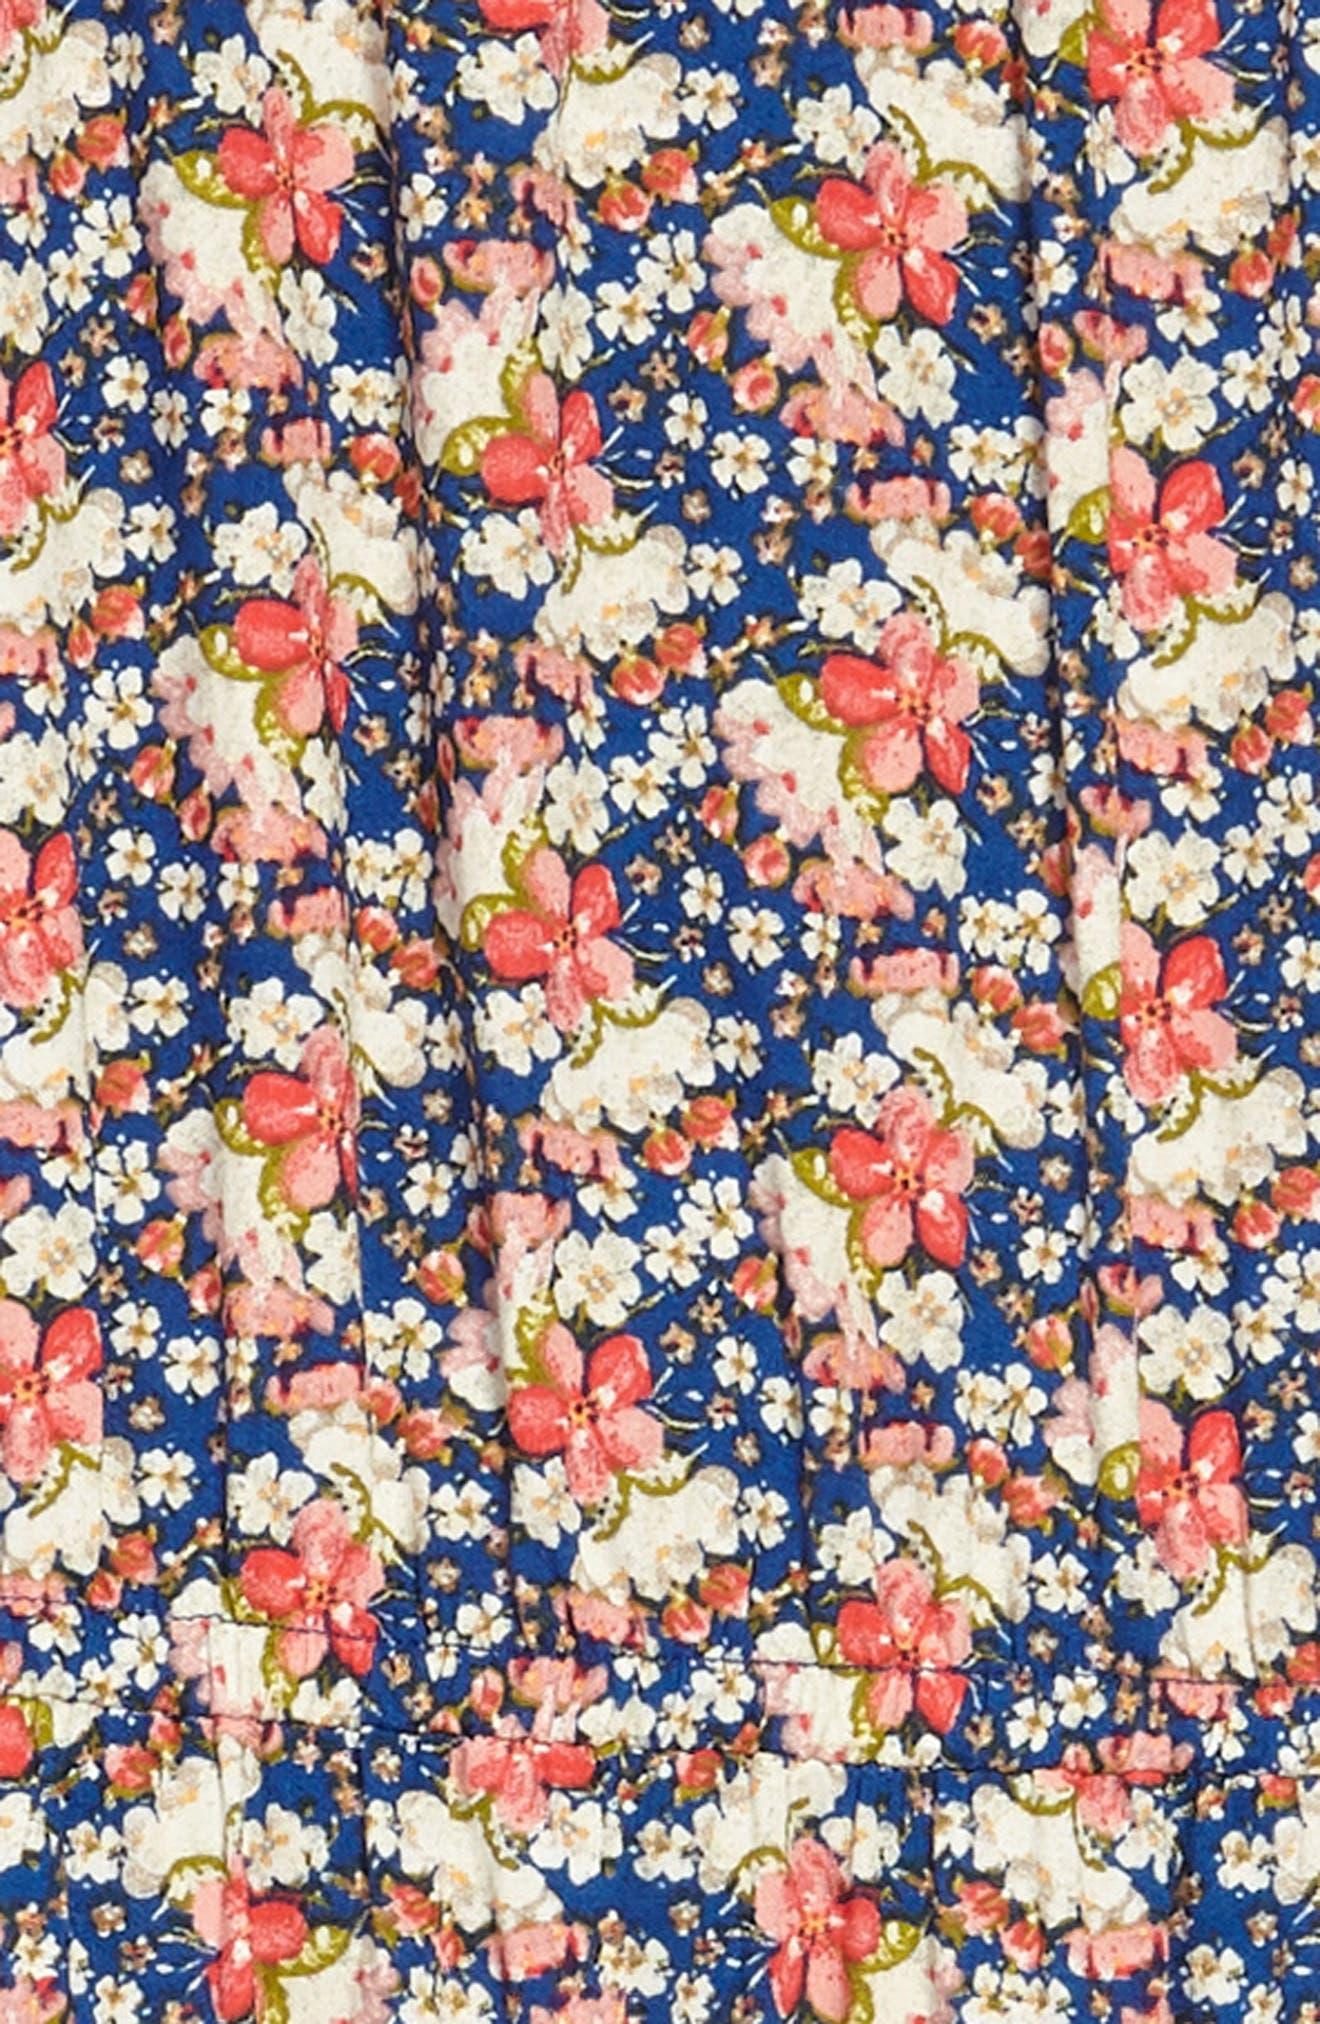 Floral Print Halter Dress,                             Alternate thumbnail 3, color,                             Royal Floral